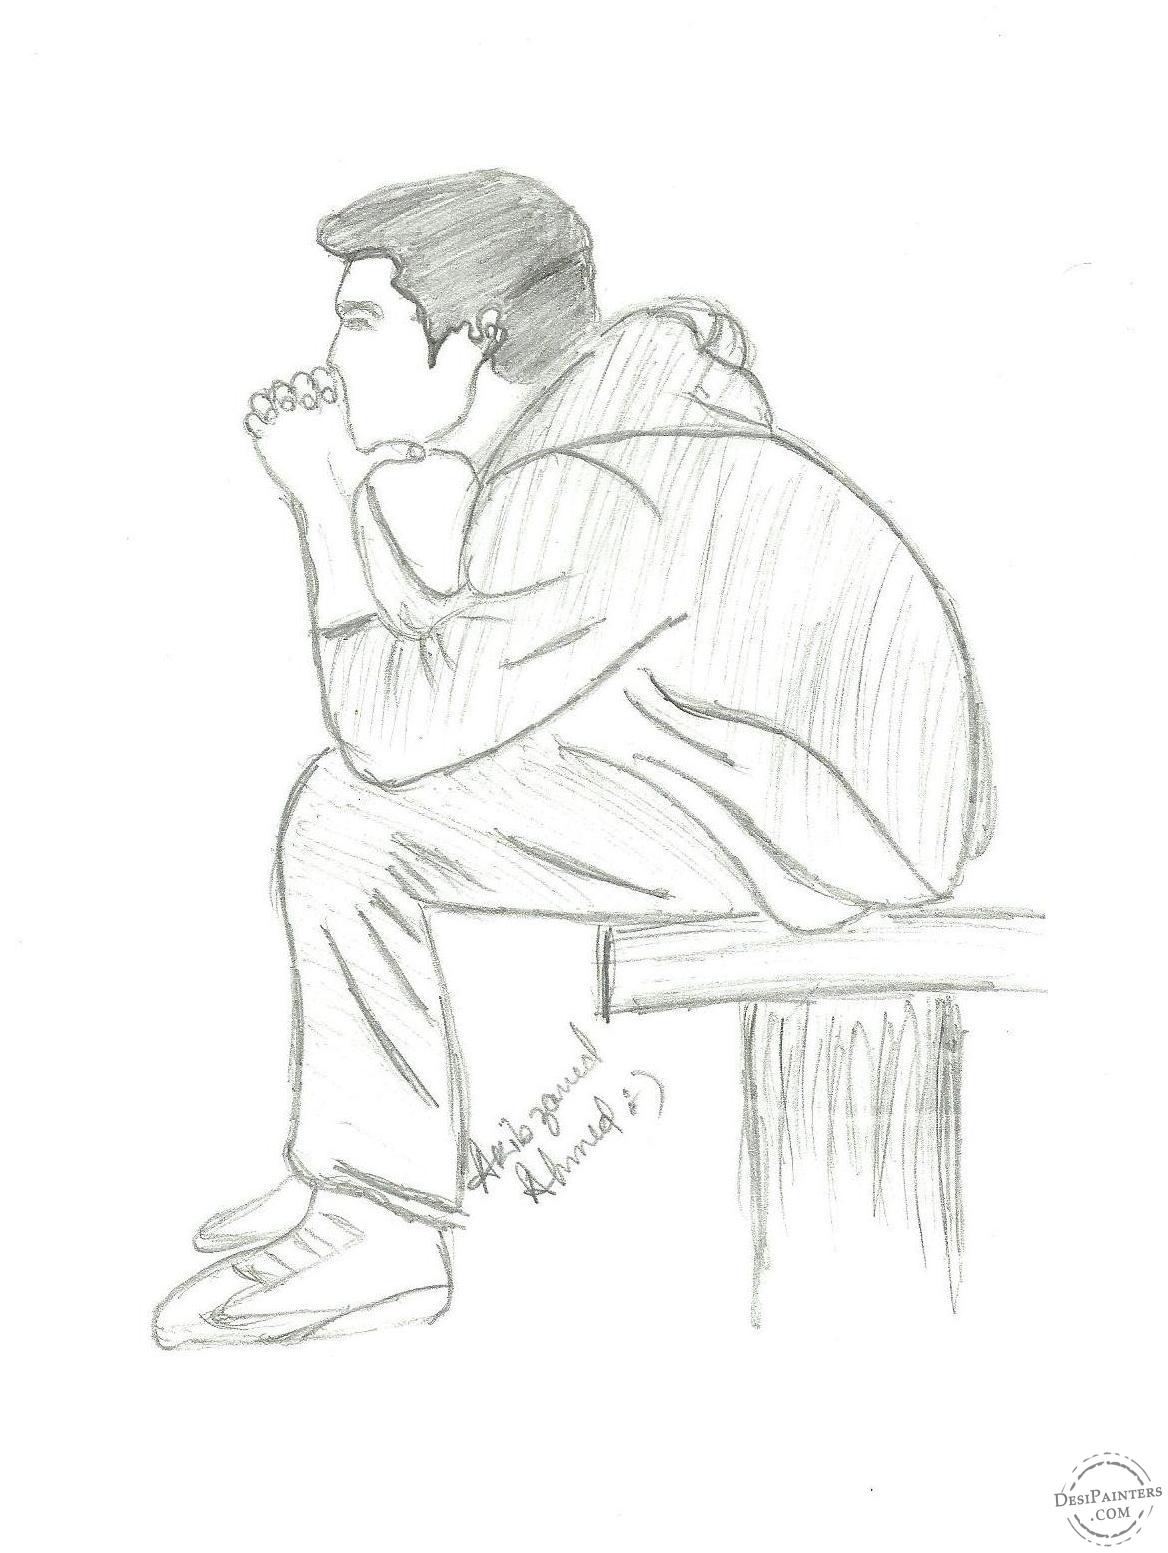 1168x1553 Alone Boy Sketch Pencil Alone Boy In The Rain Pencil Sketch Sad